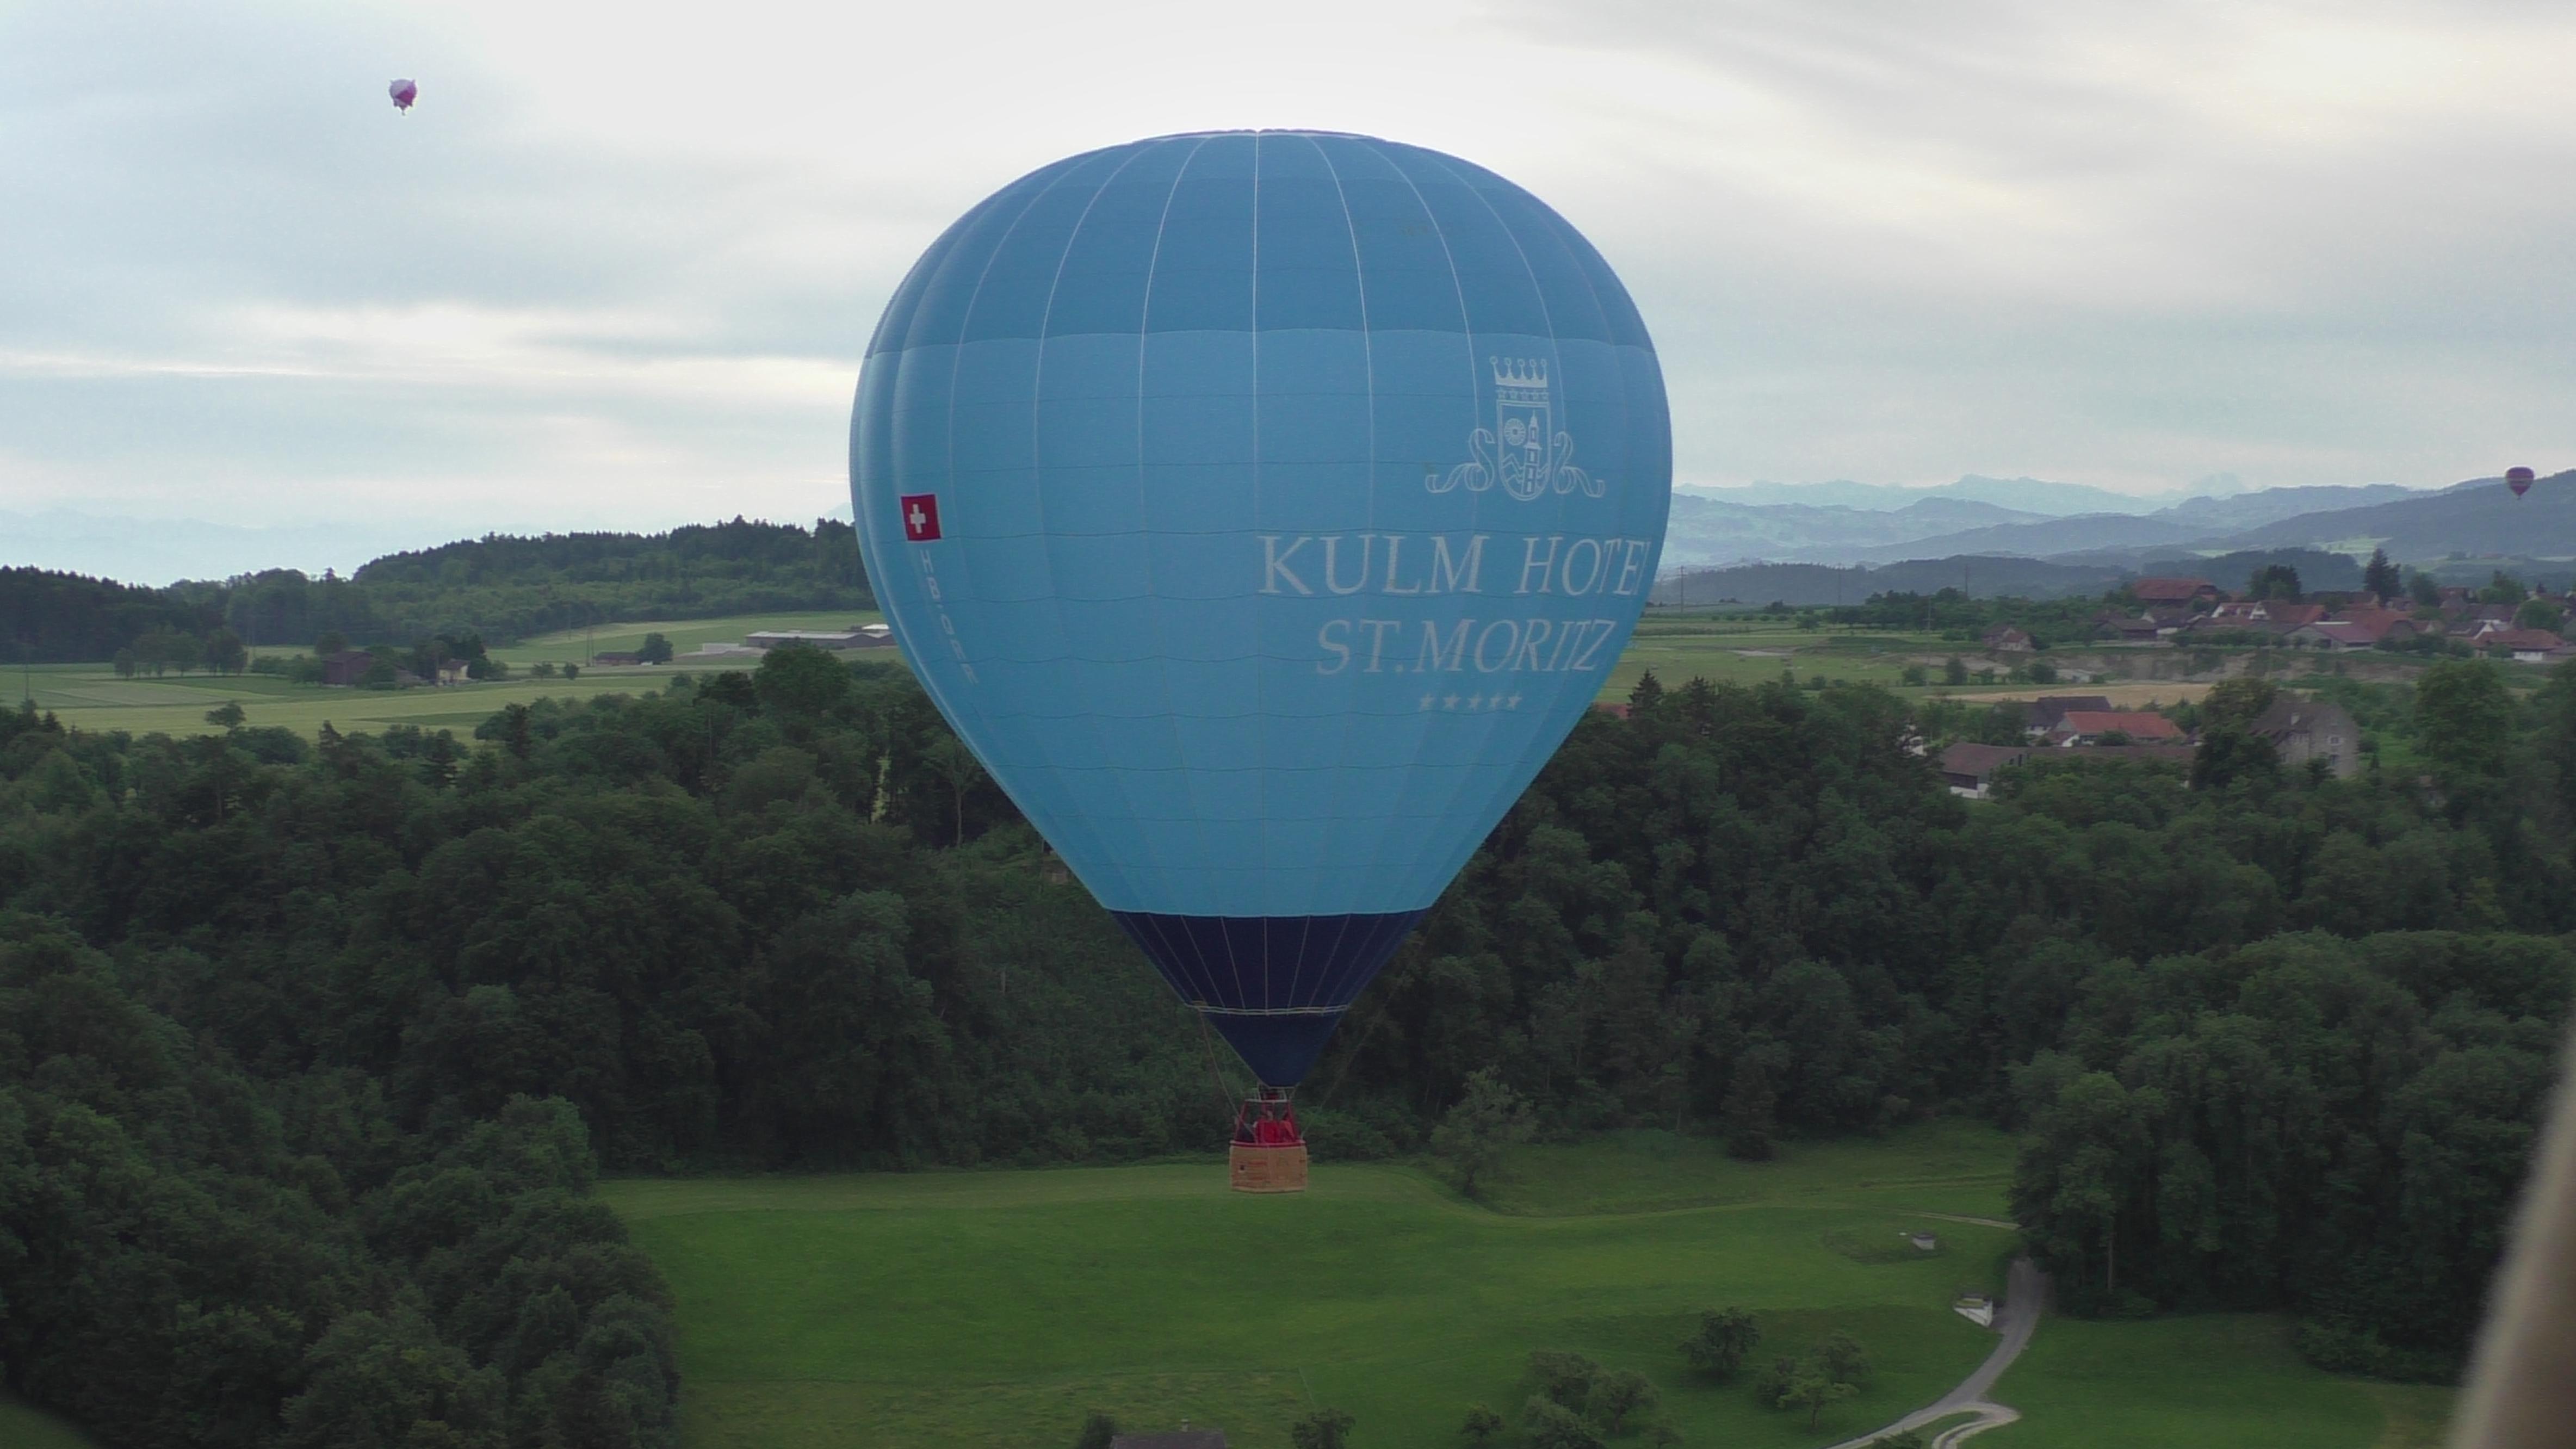 Rappiballon_thedi_bolli_heissluftballon_ballonfahren_Rapperswil_ballonangebo_gallerie2.